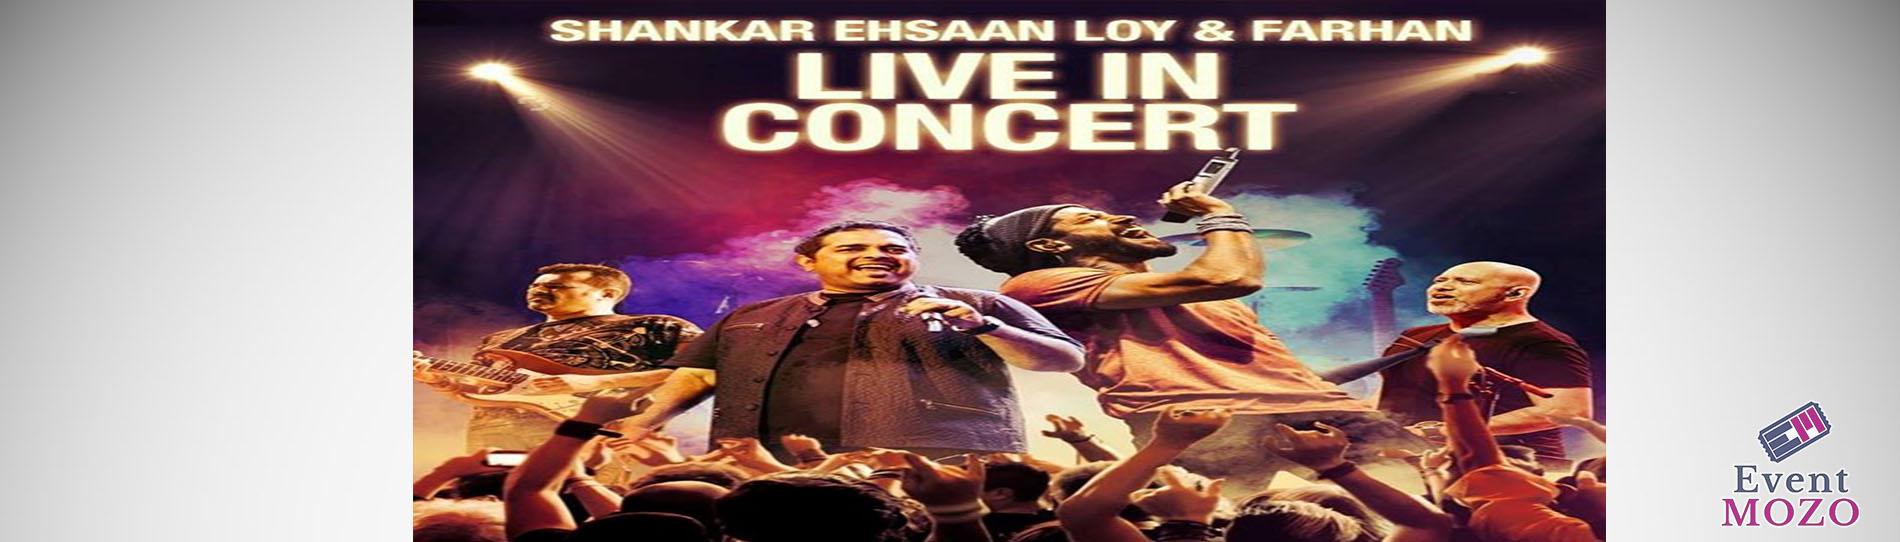 EventMozo Shankar Ehsaan Loy Farhan Akhtar live in concert